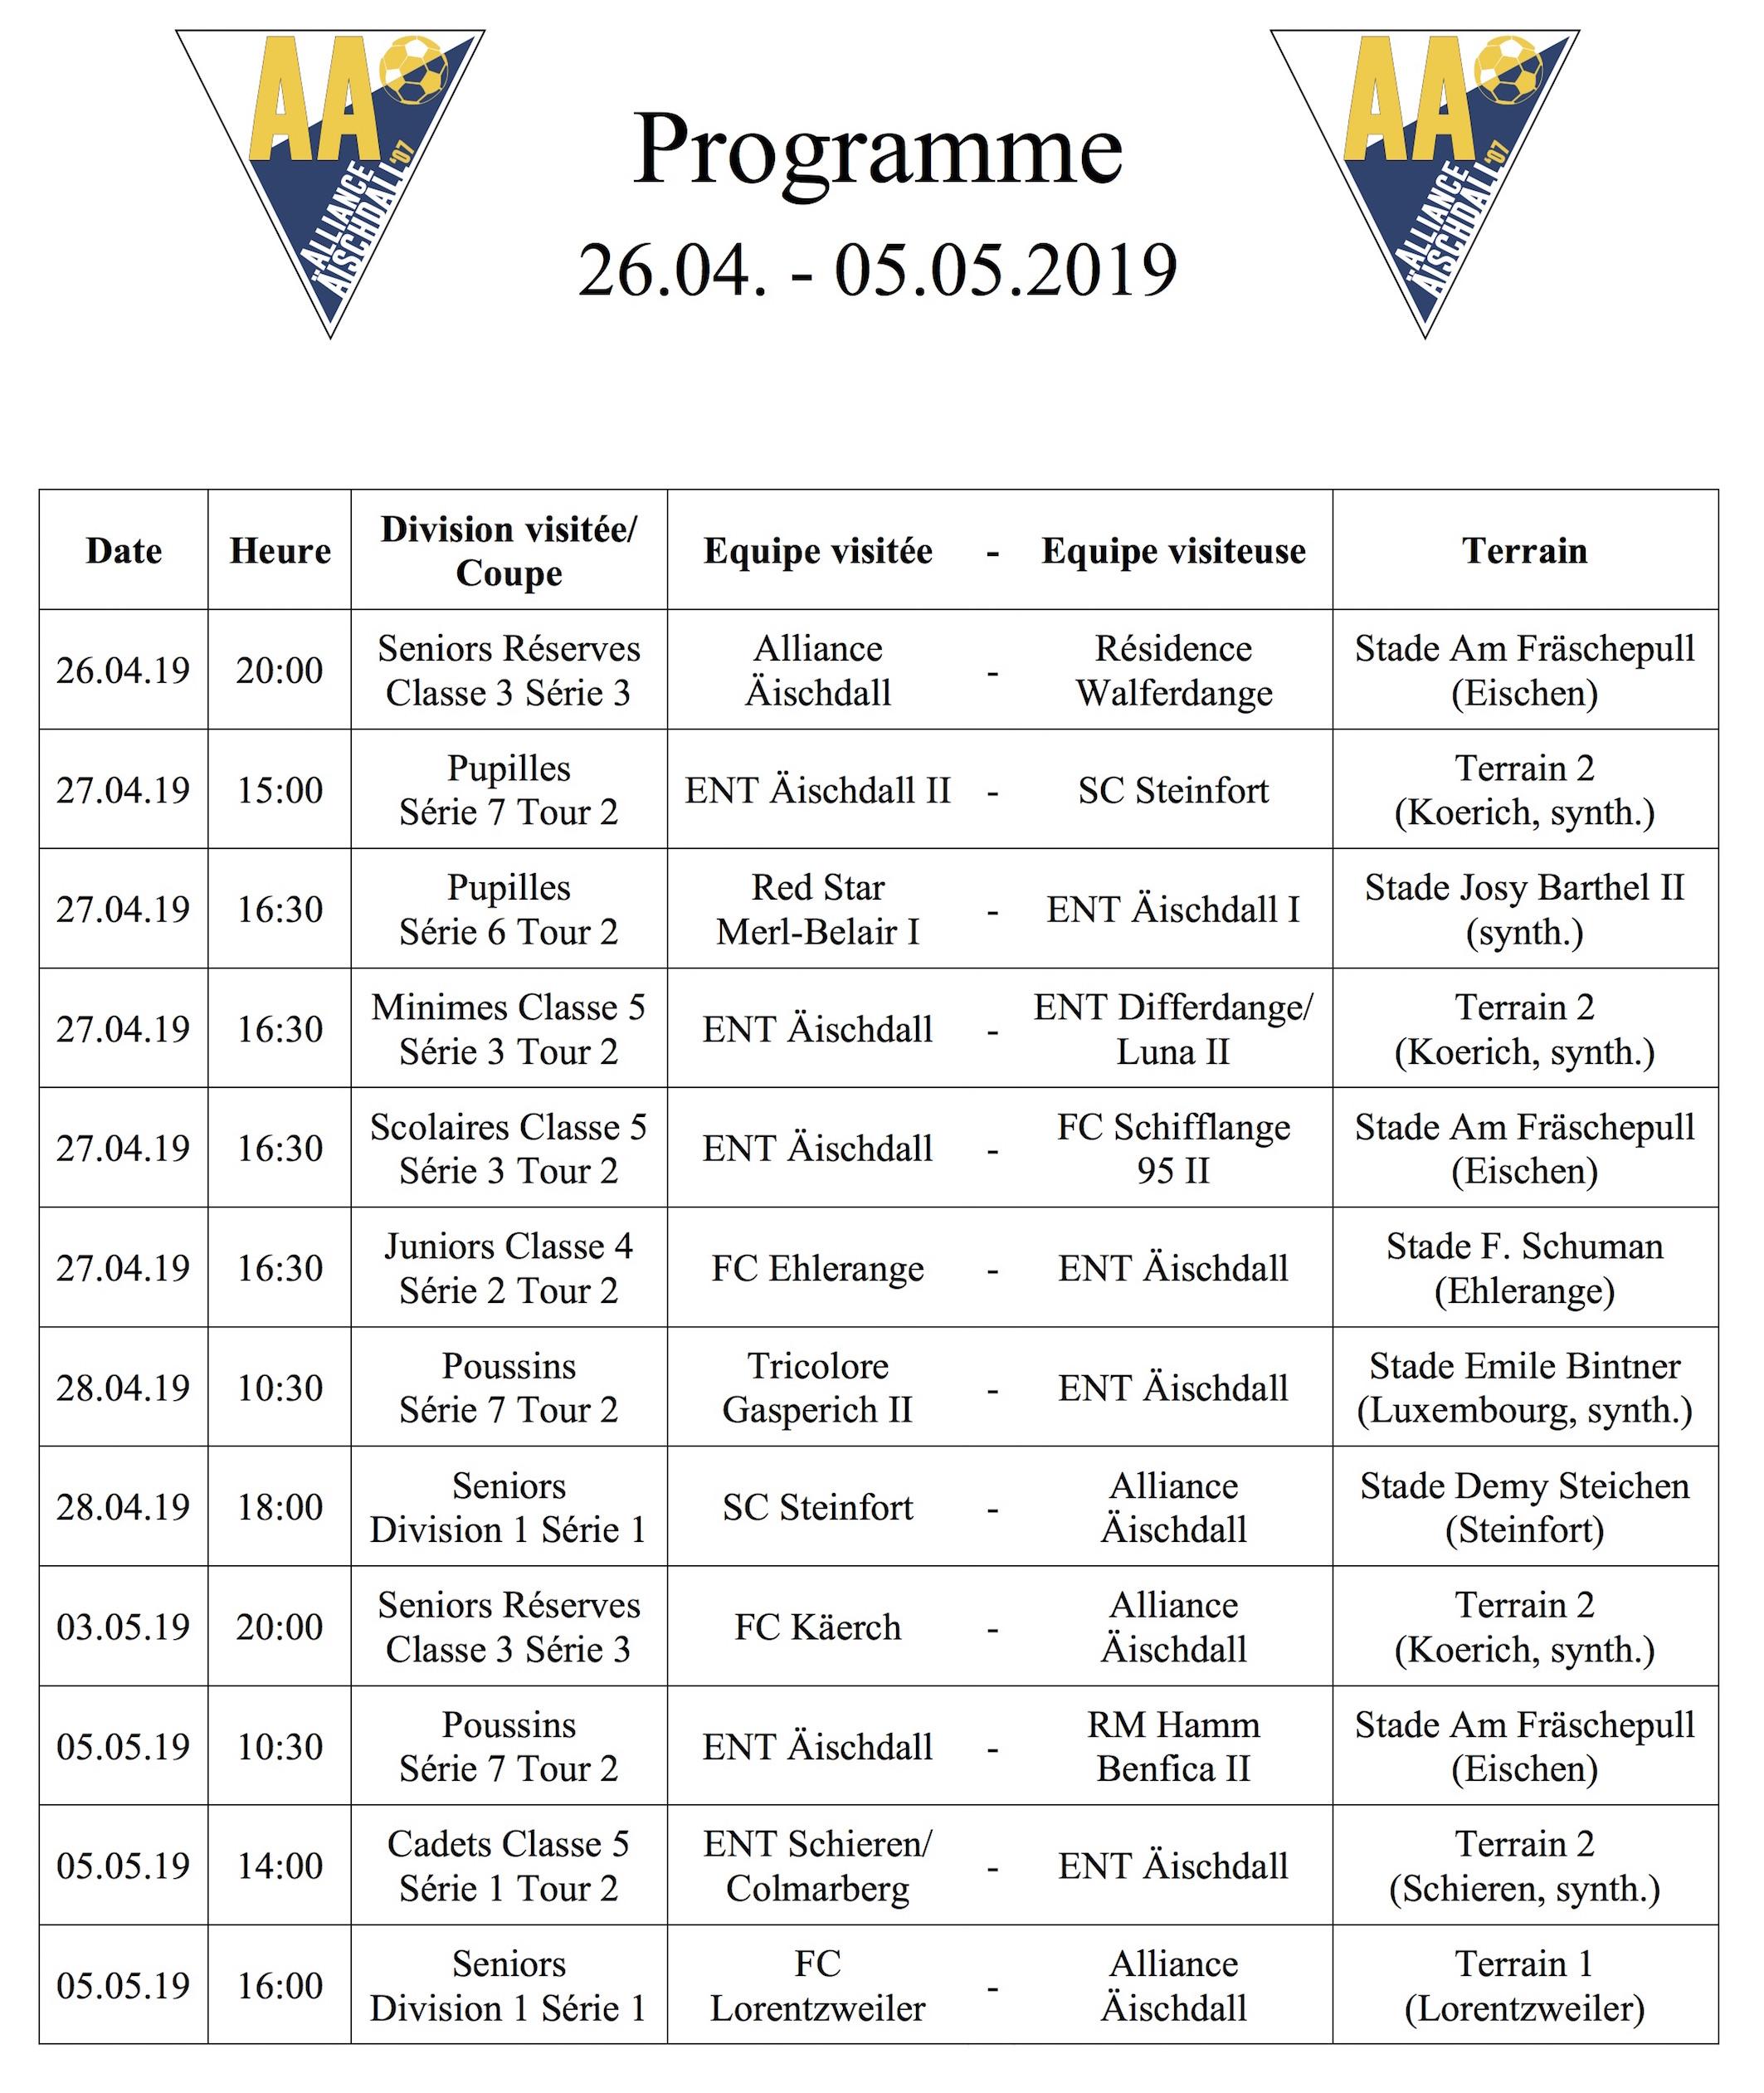 Programm 26.04.-05.05.2019